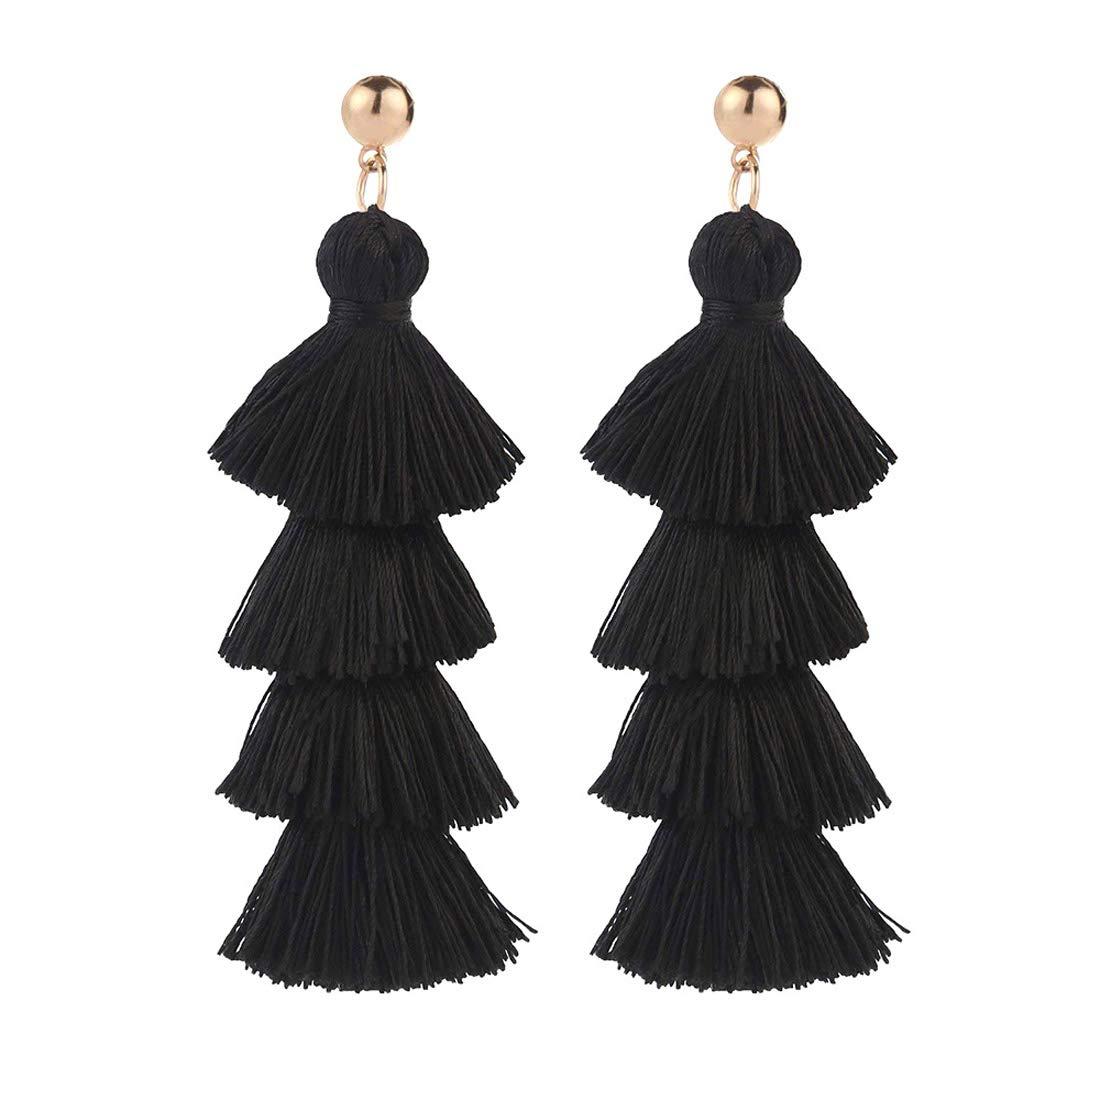 Tassel Tiered Earrings Handmade 4 Layers Elegant Thread Drop Dangle Girls Jewelry